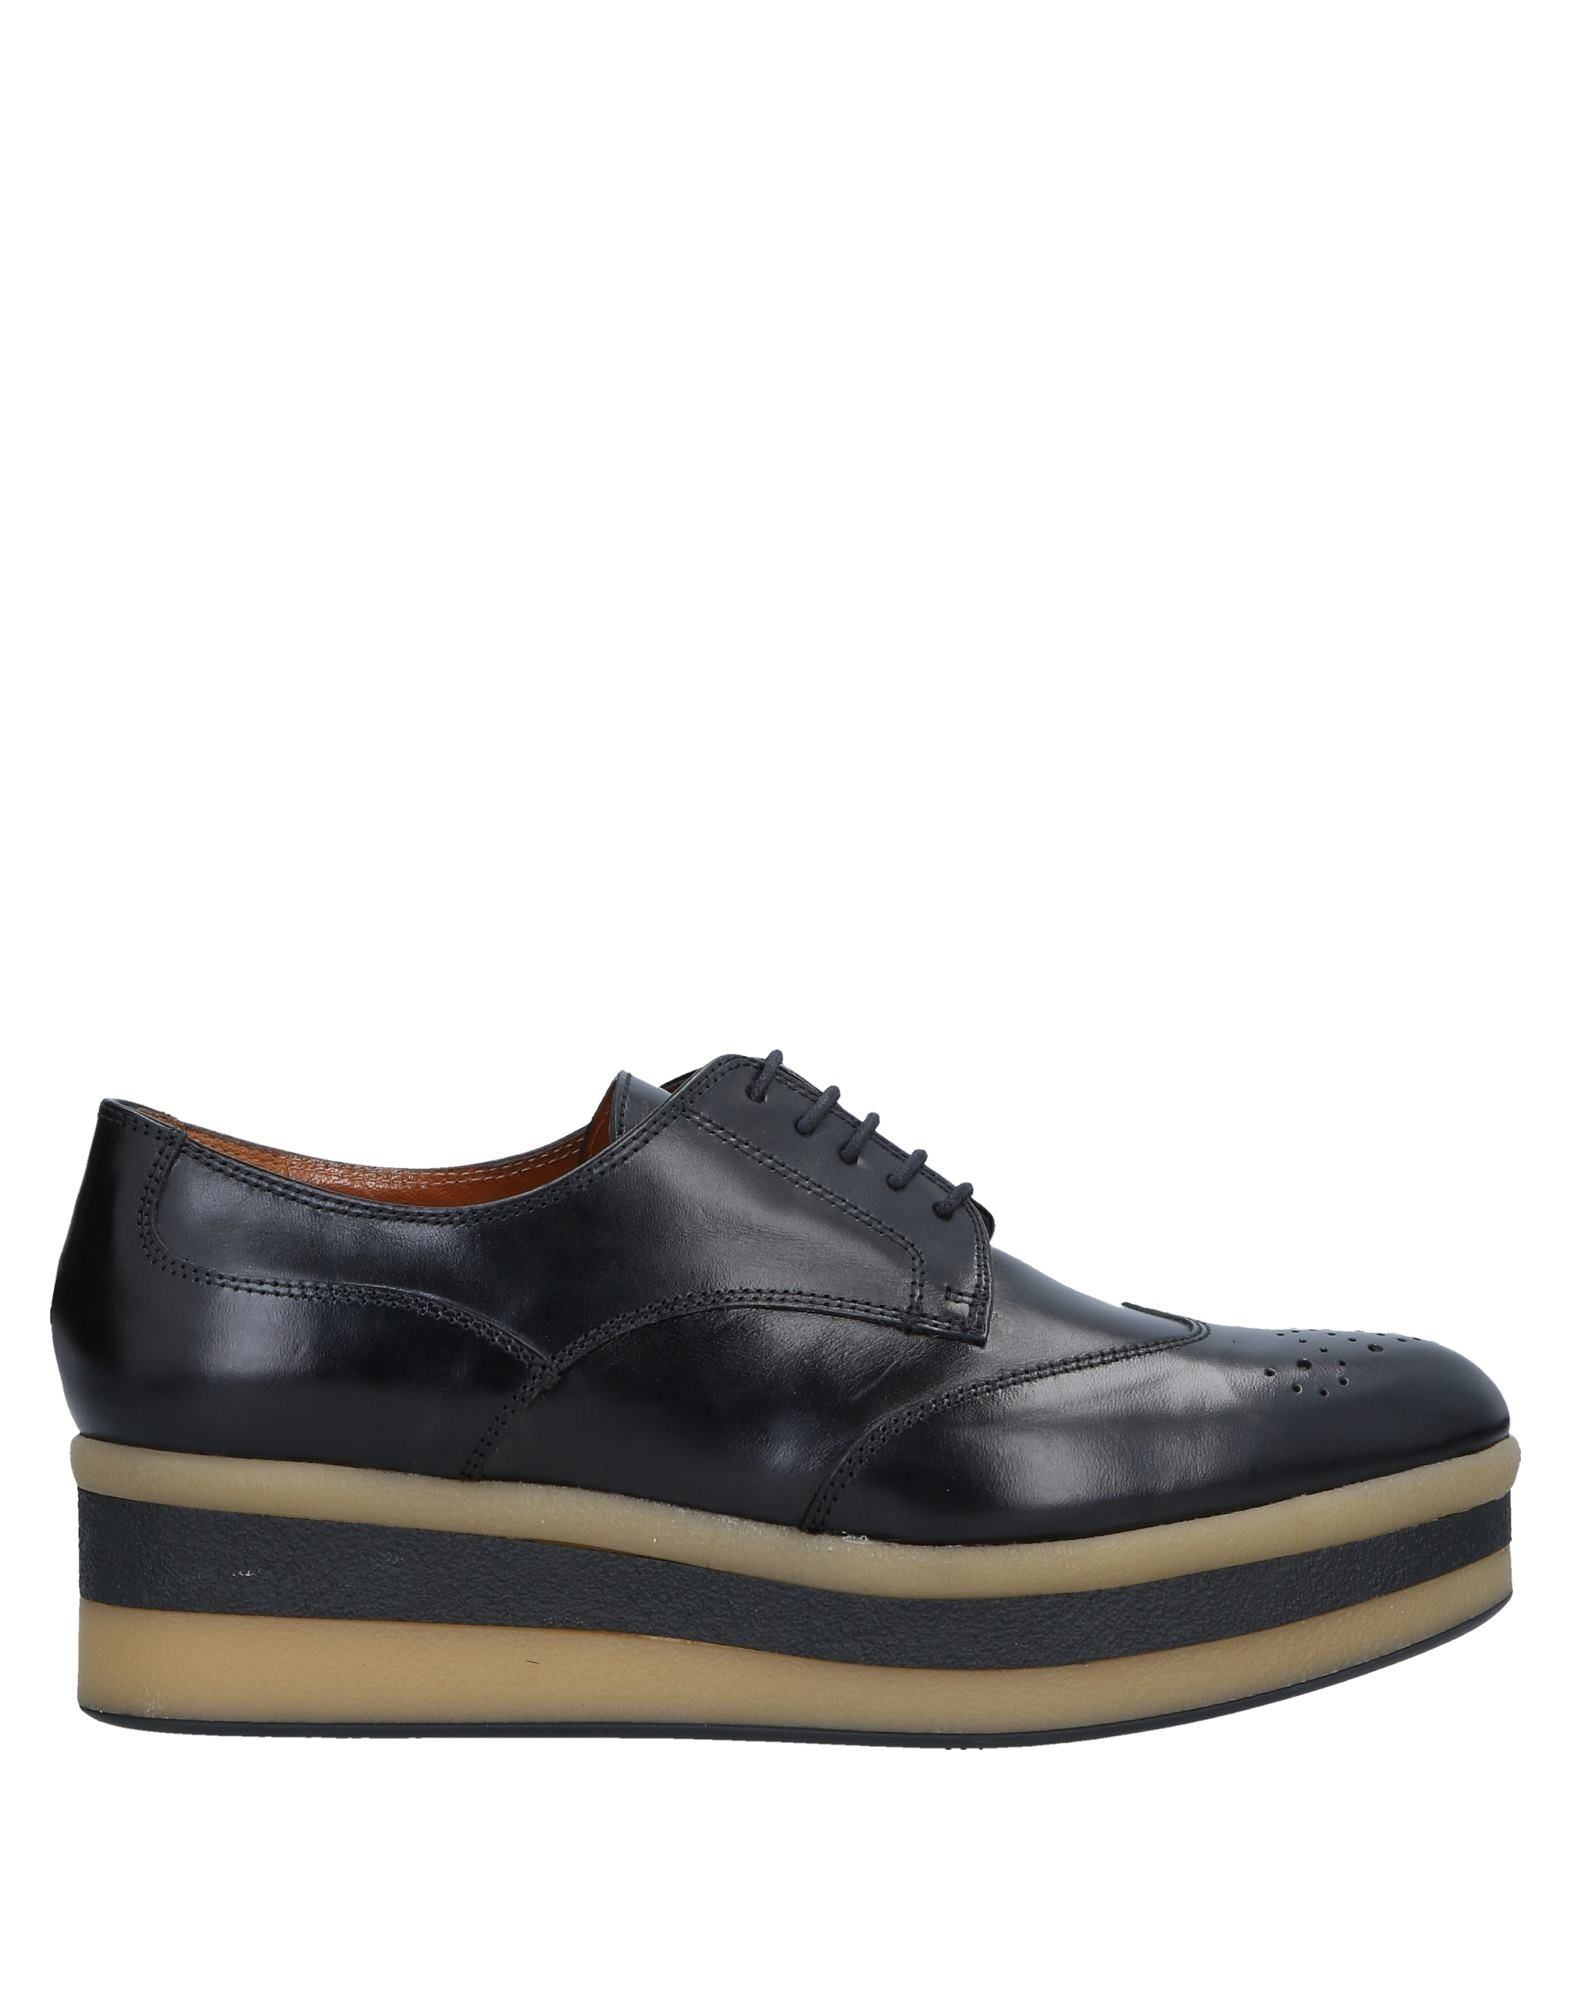 Stilvolle billige Schuhe Pons Quintana Schnürschuhe Damen  11519407IC